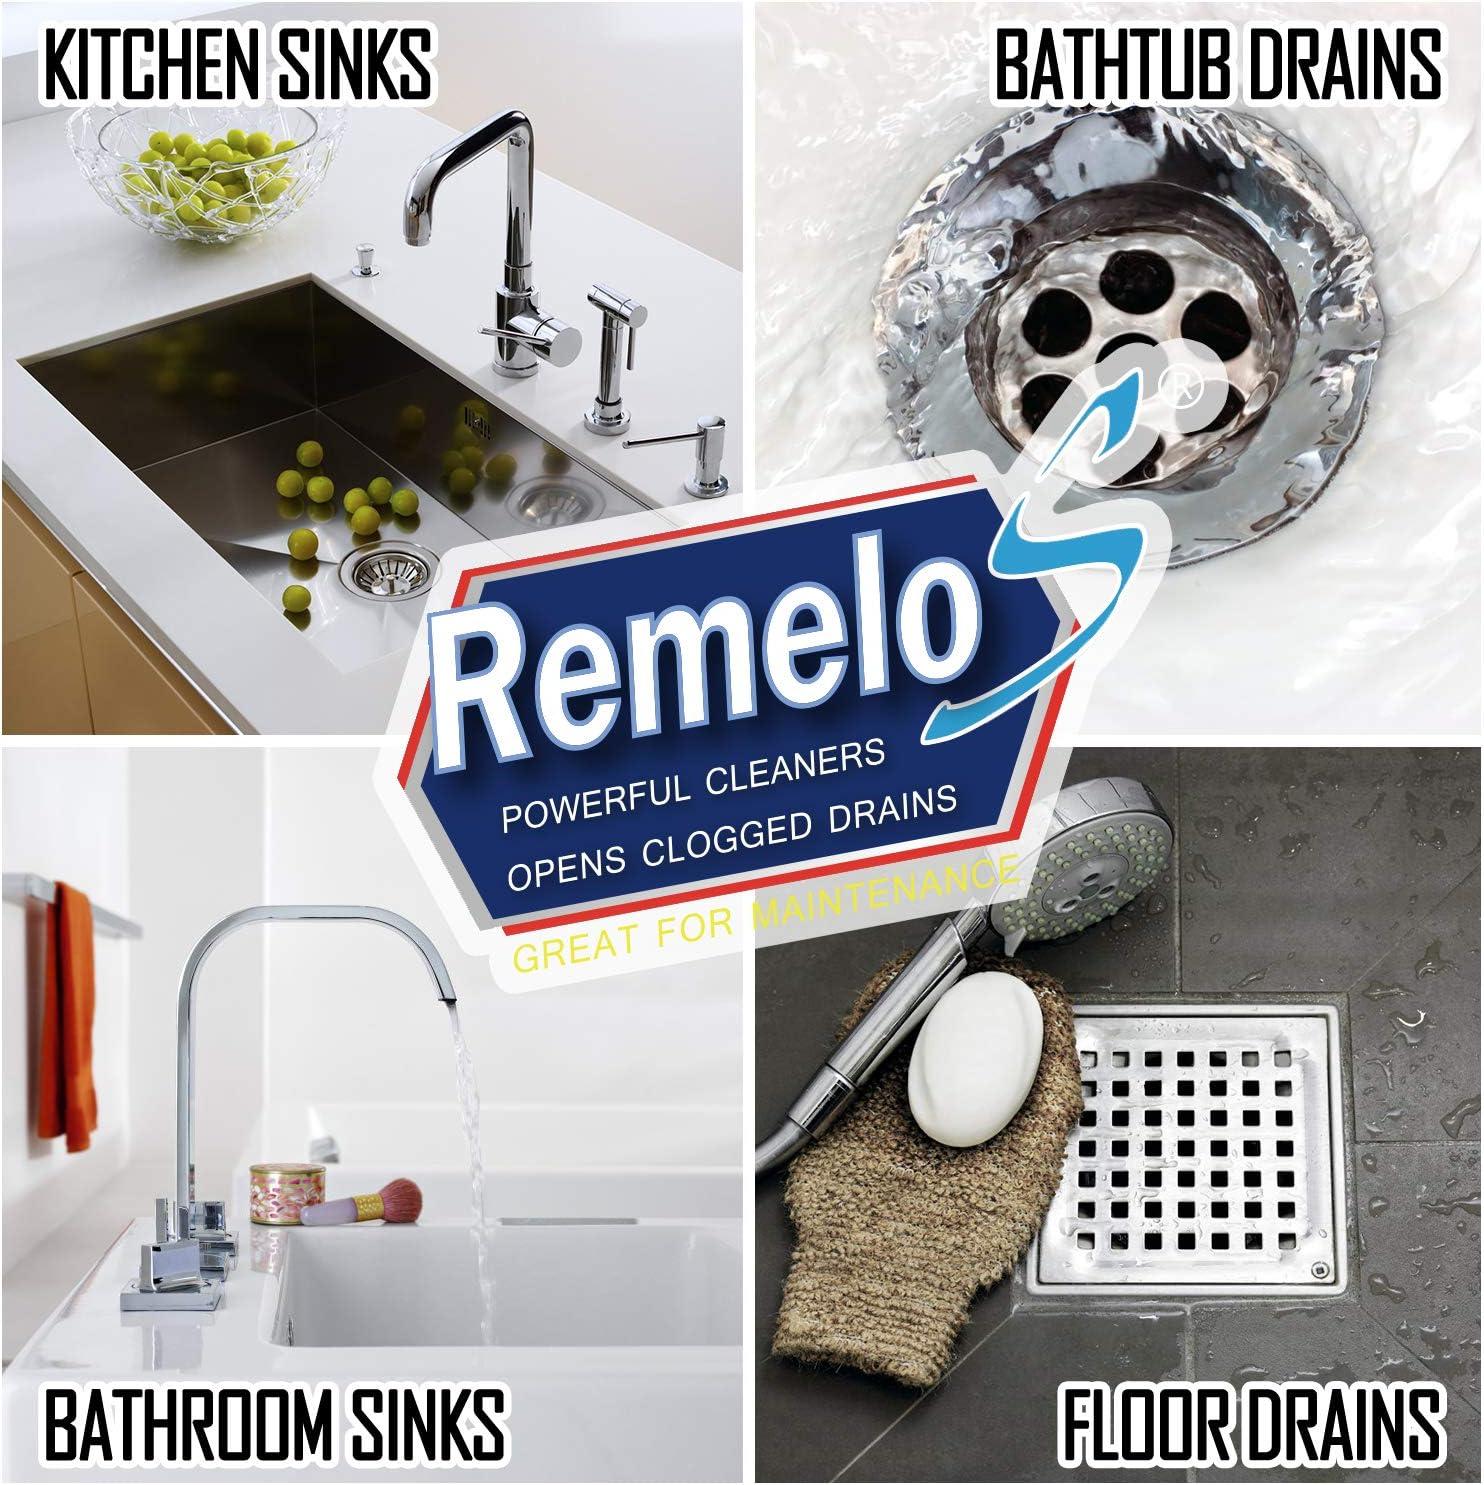 Buy Drain Sticks Drain Stix Drain Cleaner Deodorizer Sticks Drainstix For Clogs Kitchen Bathroom Sinks Unclog Eliminate Odor Septic Tank 48pack Online In Vietnam B07k2xn8h4